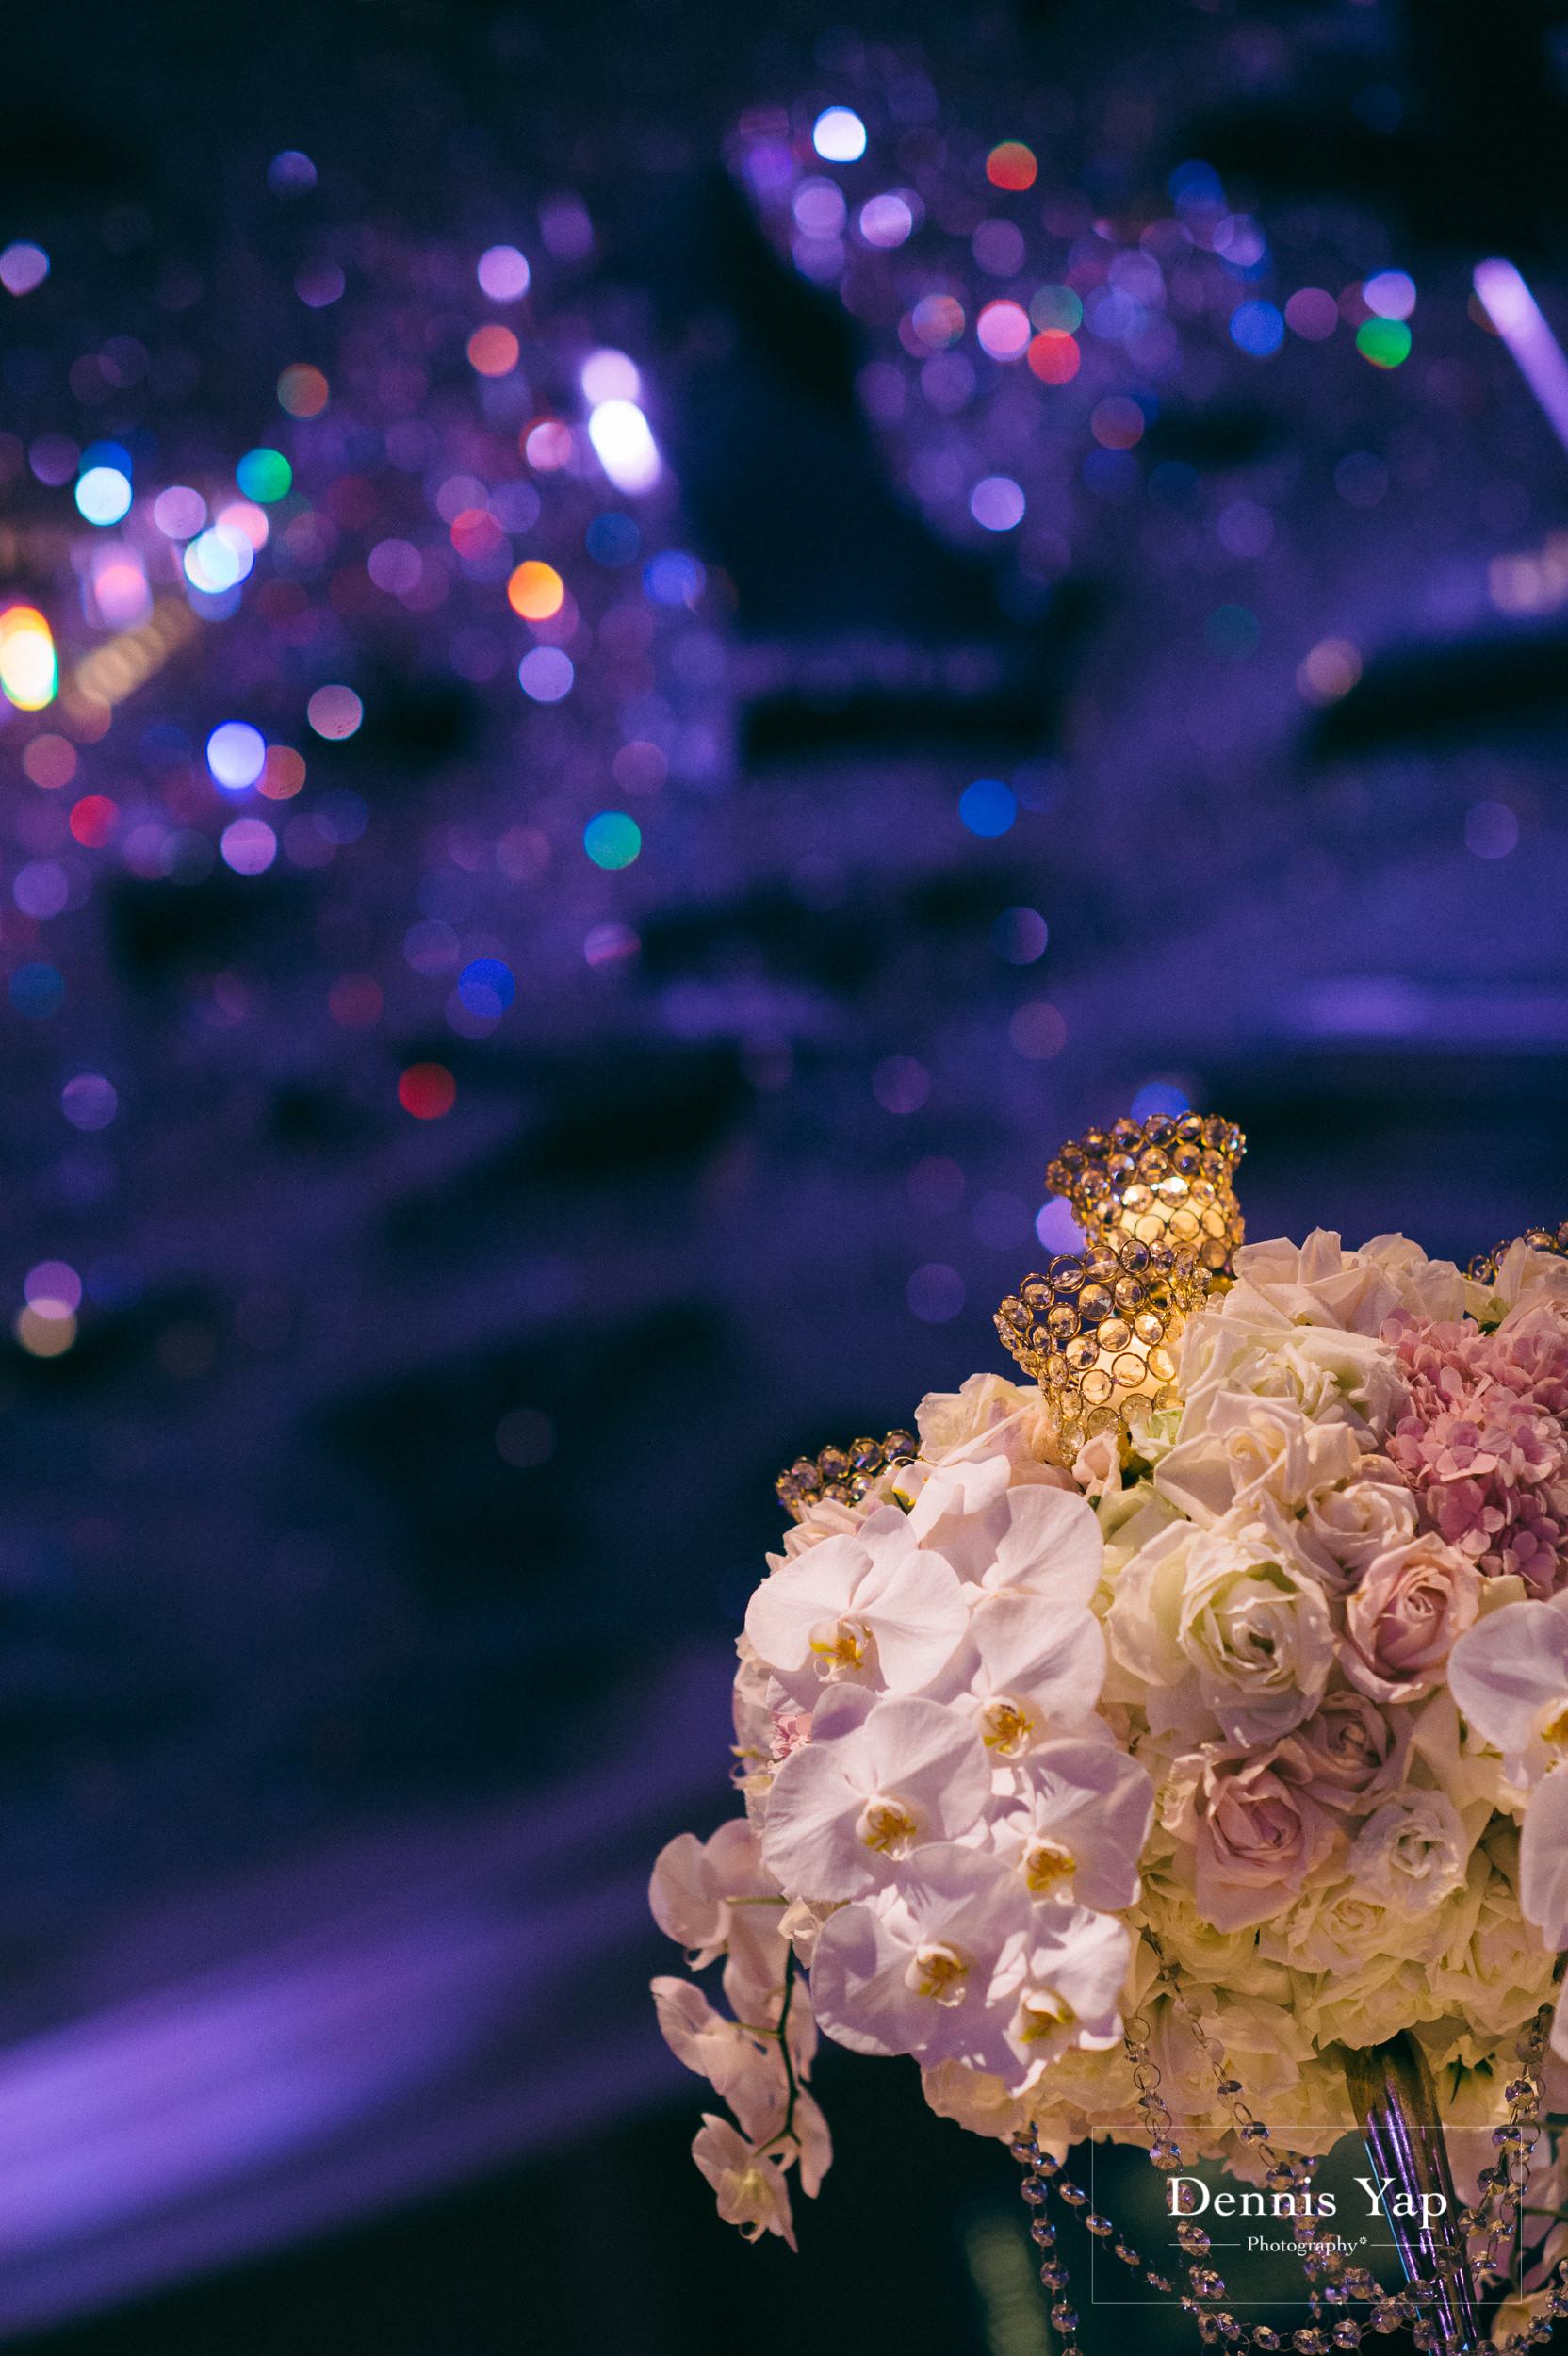 nelson bee yi wedding banquet grand hyatt kuala lumpur dennis yap photography jovita lo wedding-3.jpg